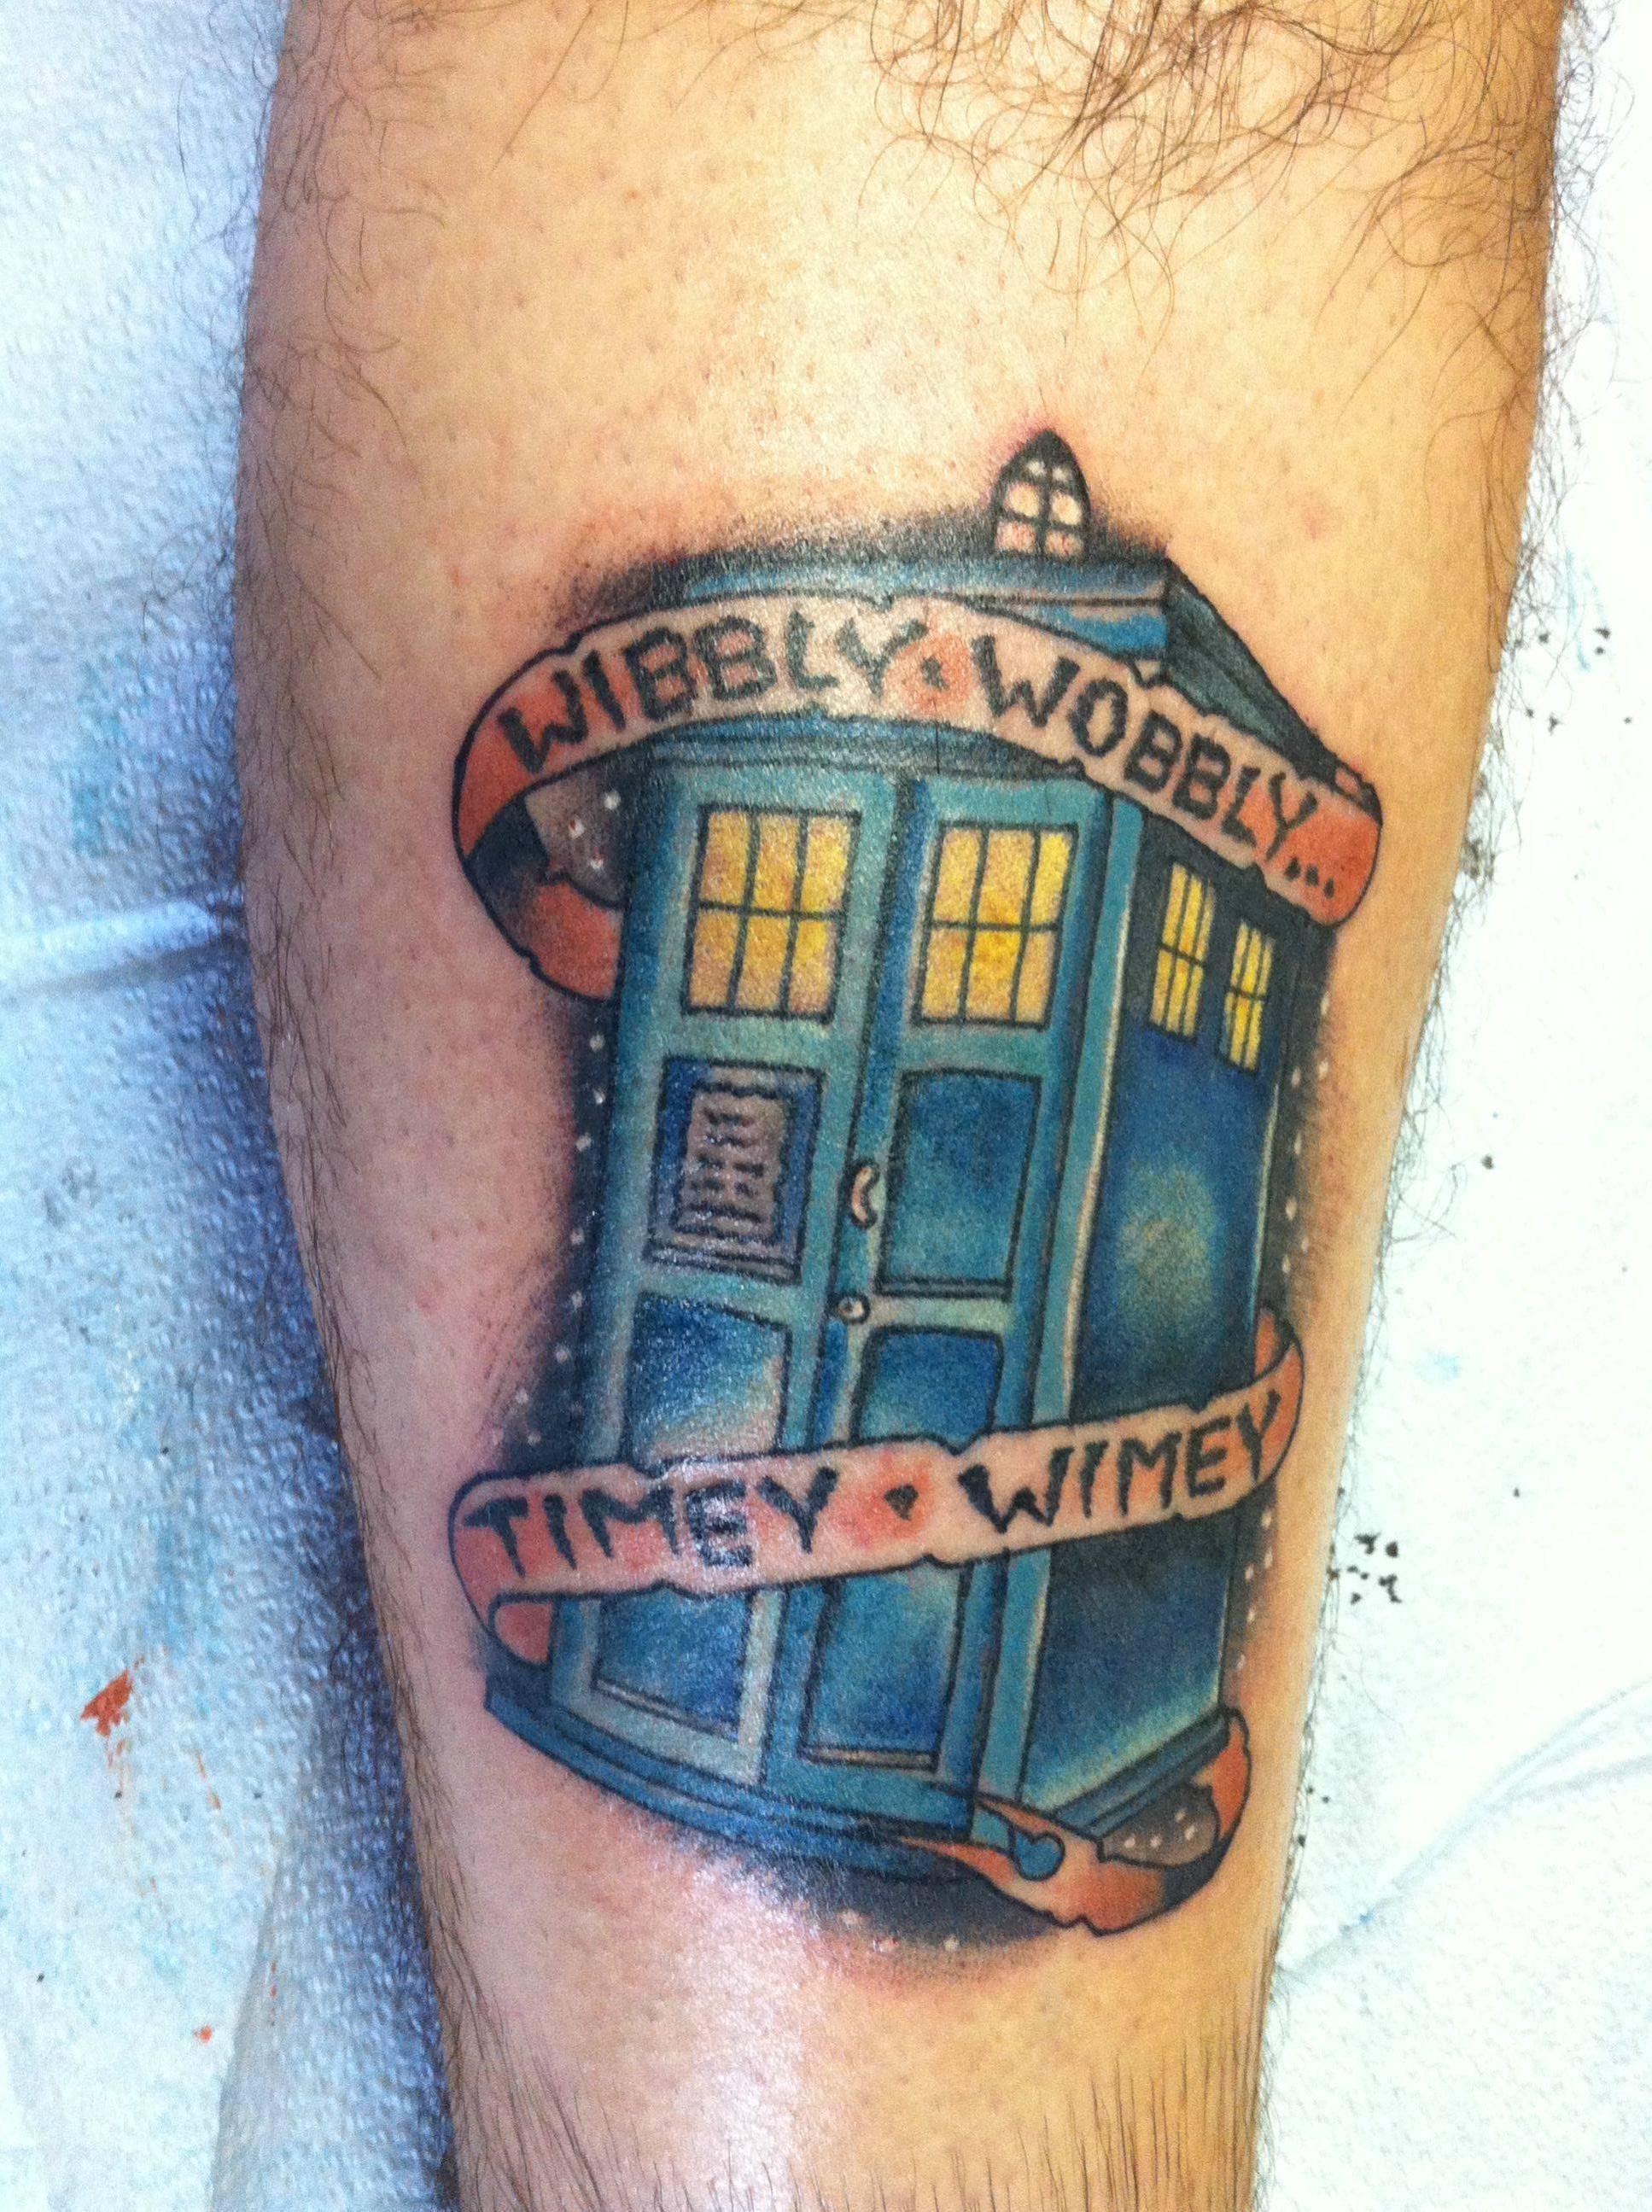 Leeslittlewonderland meaningful tattoos good ideas - Find This Pin And More On Tatoo Idea